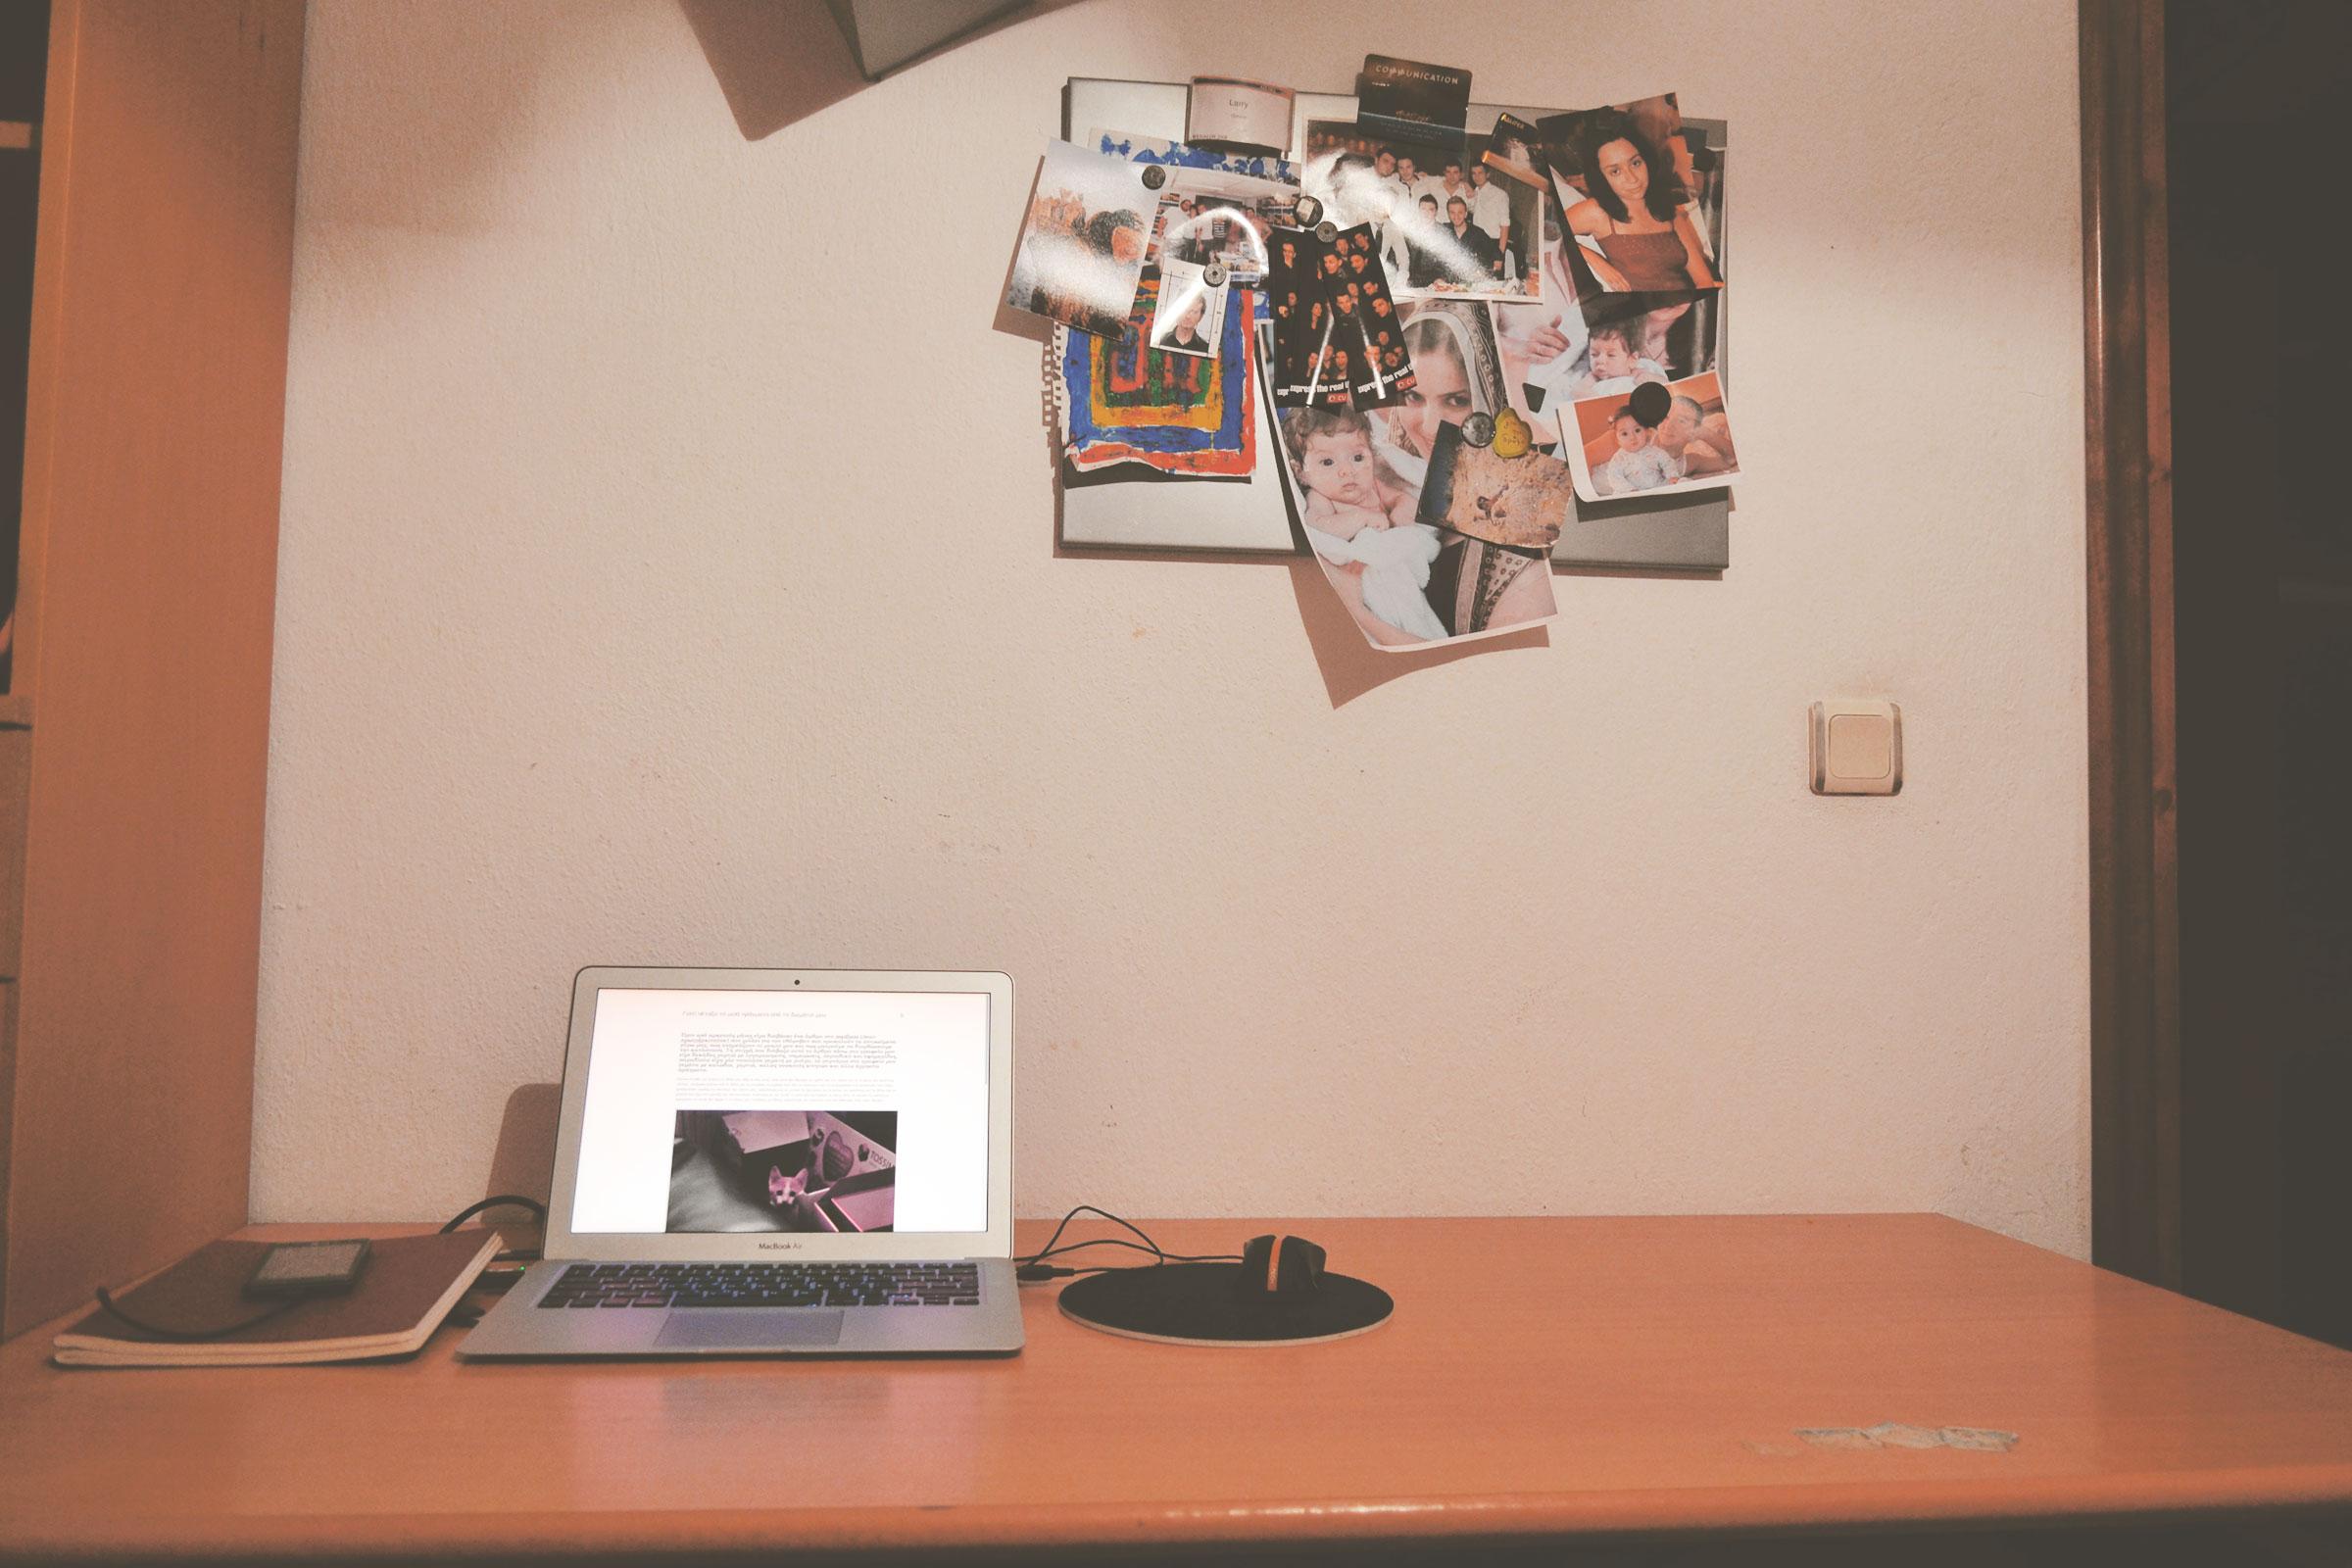 My minimal desk